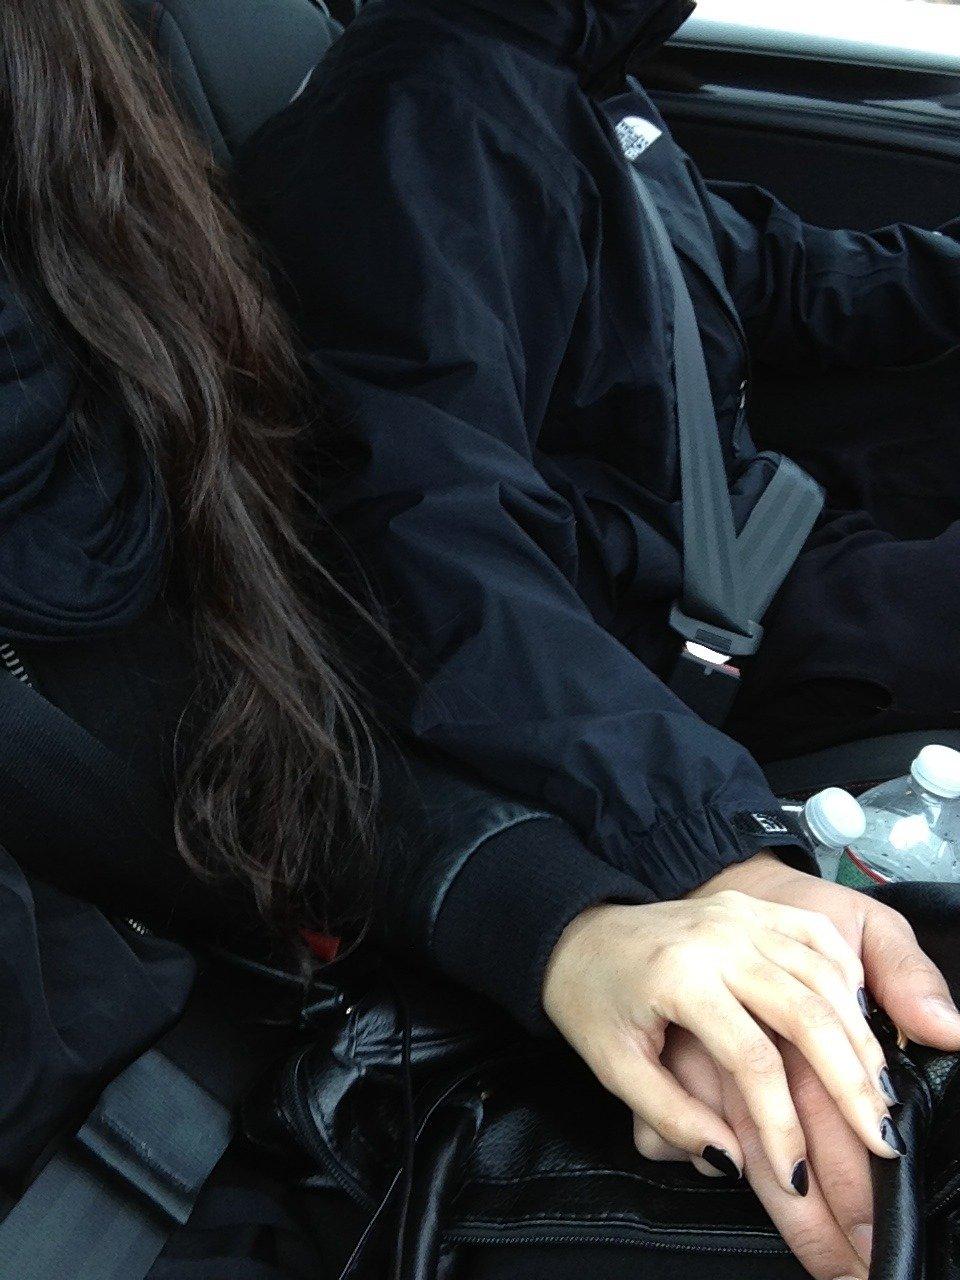 Девушка с парнем без лица в машине   подборка фото (2)